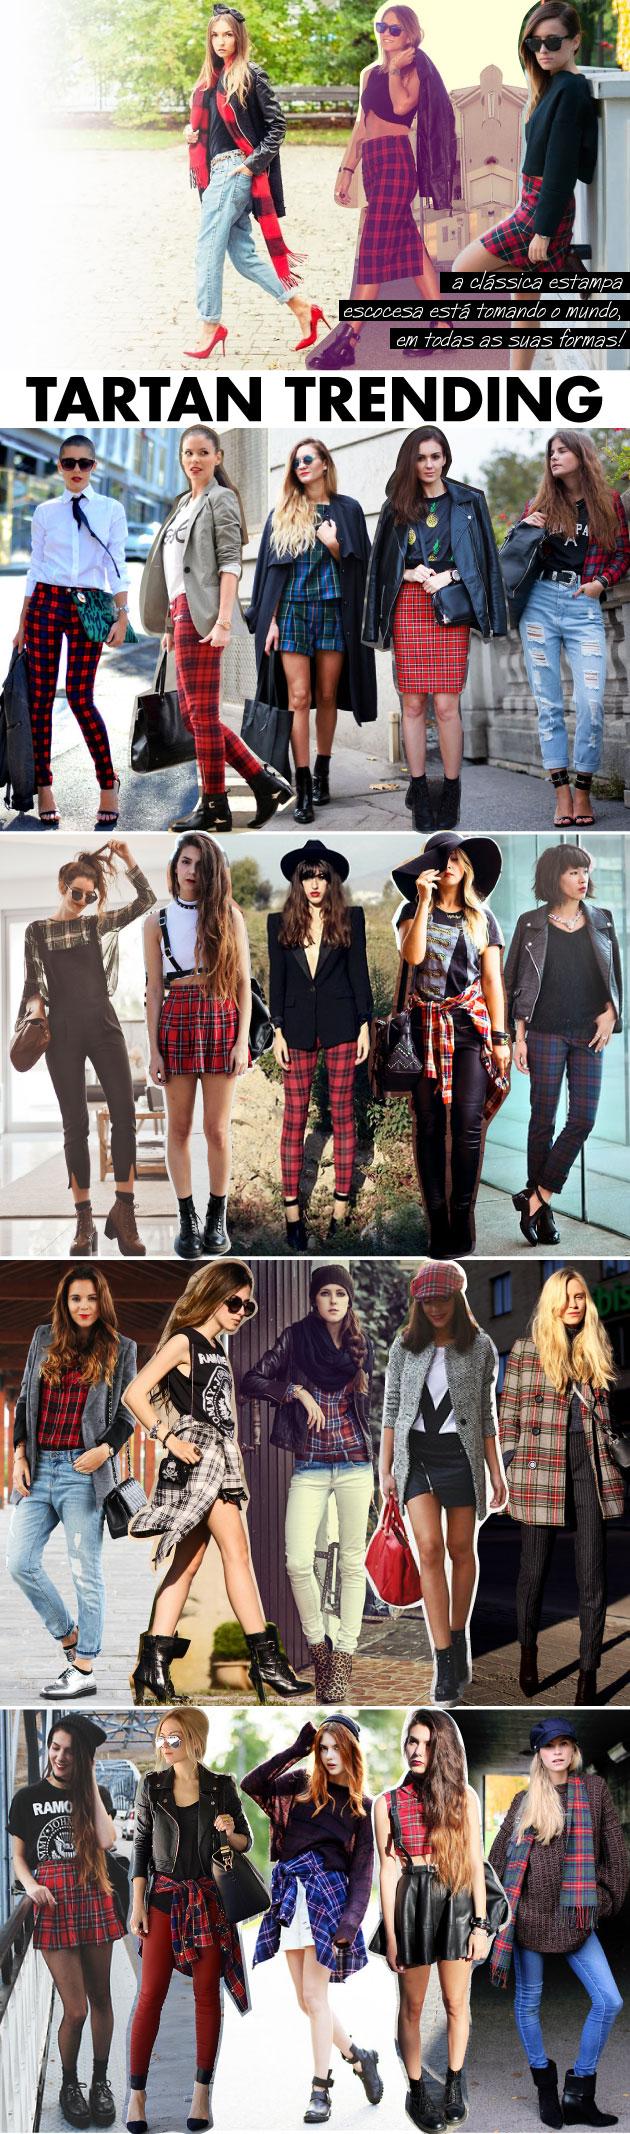 tendencia-inverno-2014-tartan-estampa-plaid-xadrez-padronagem-londres-trend-looks-estilo-